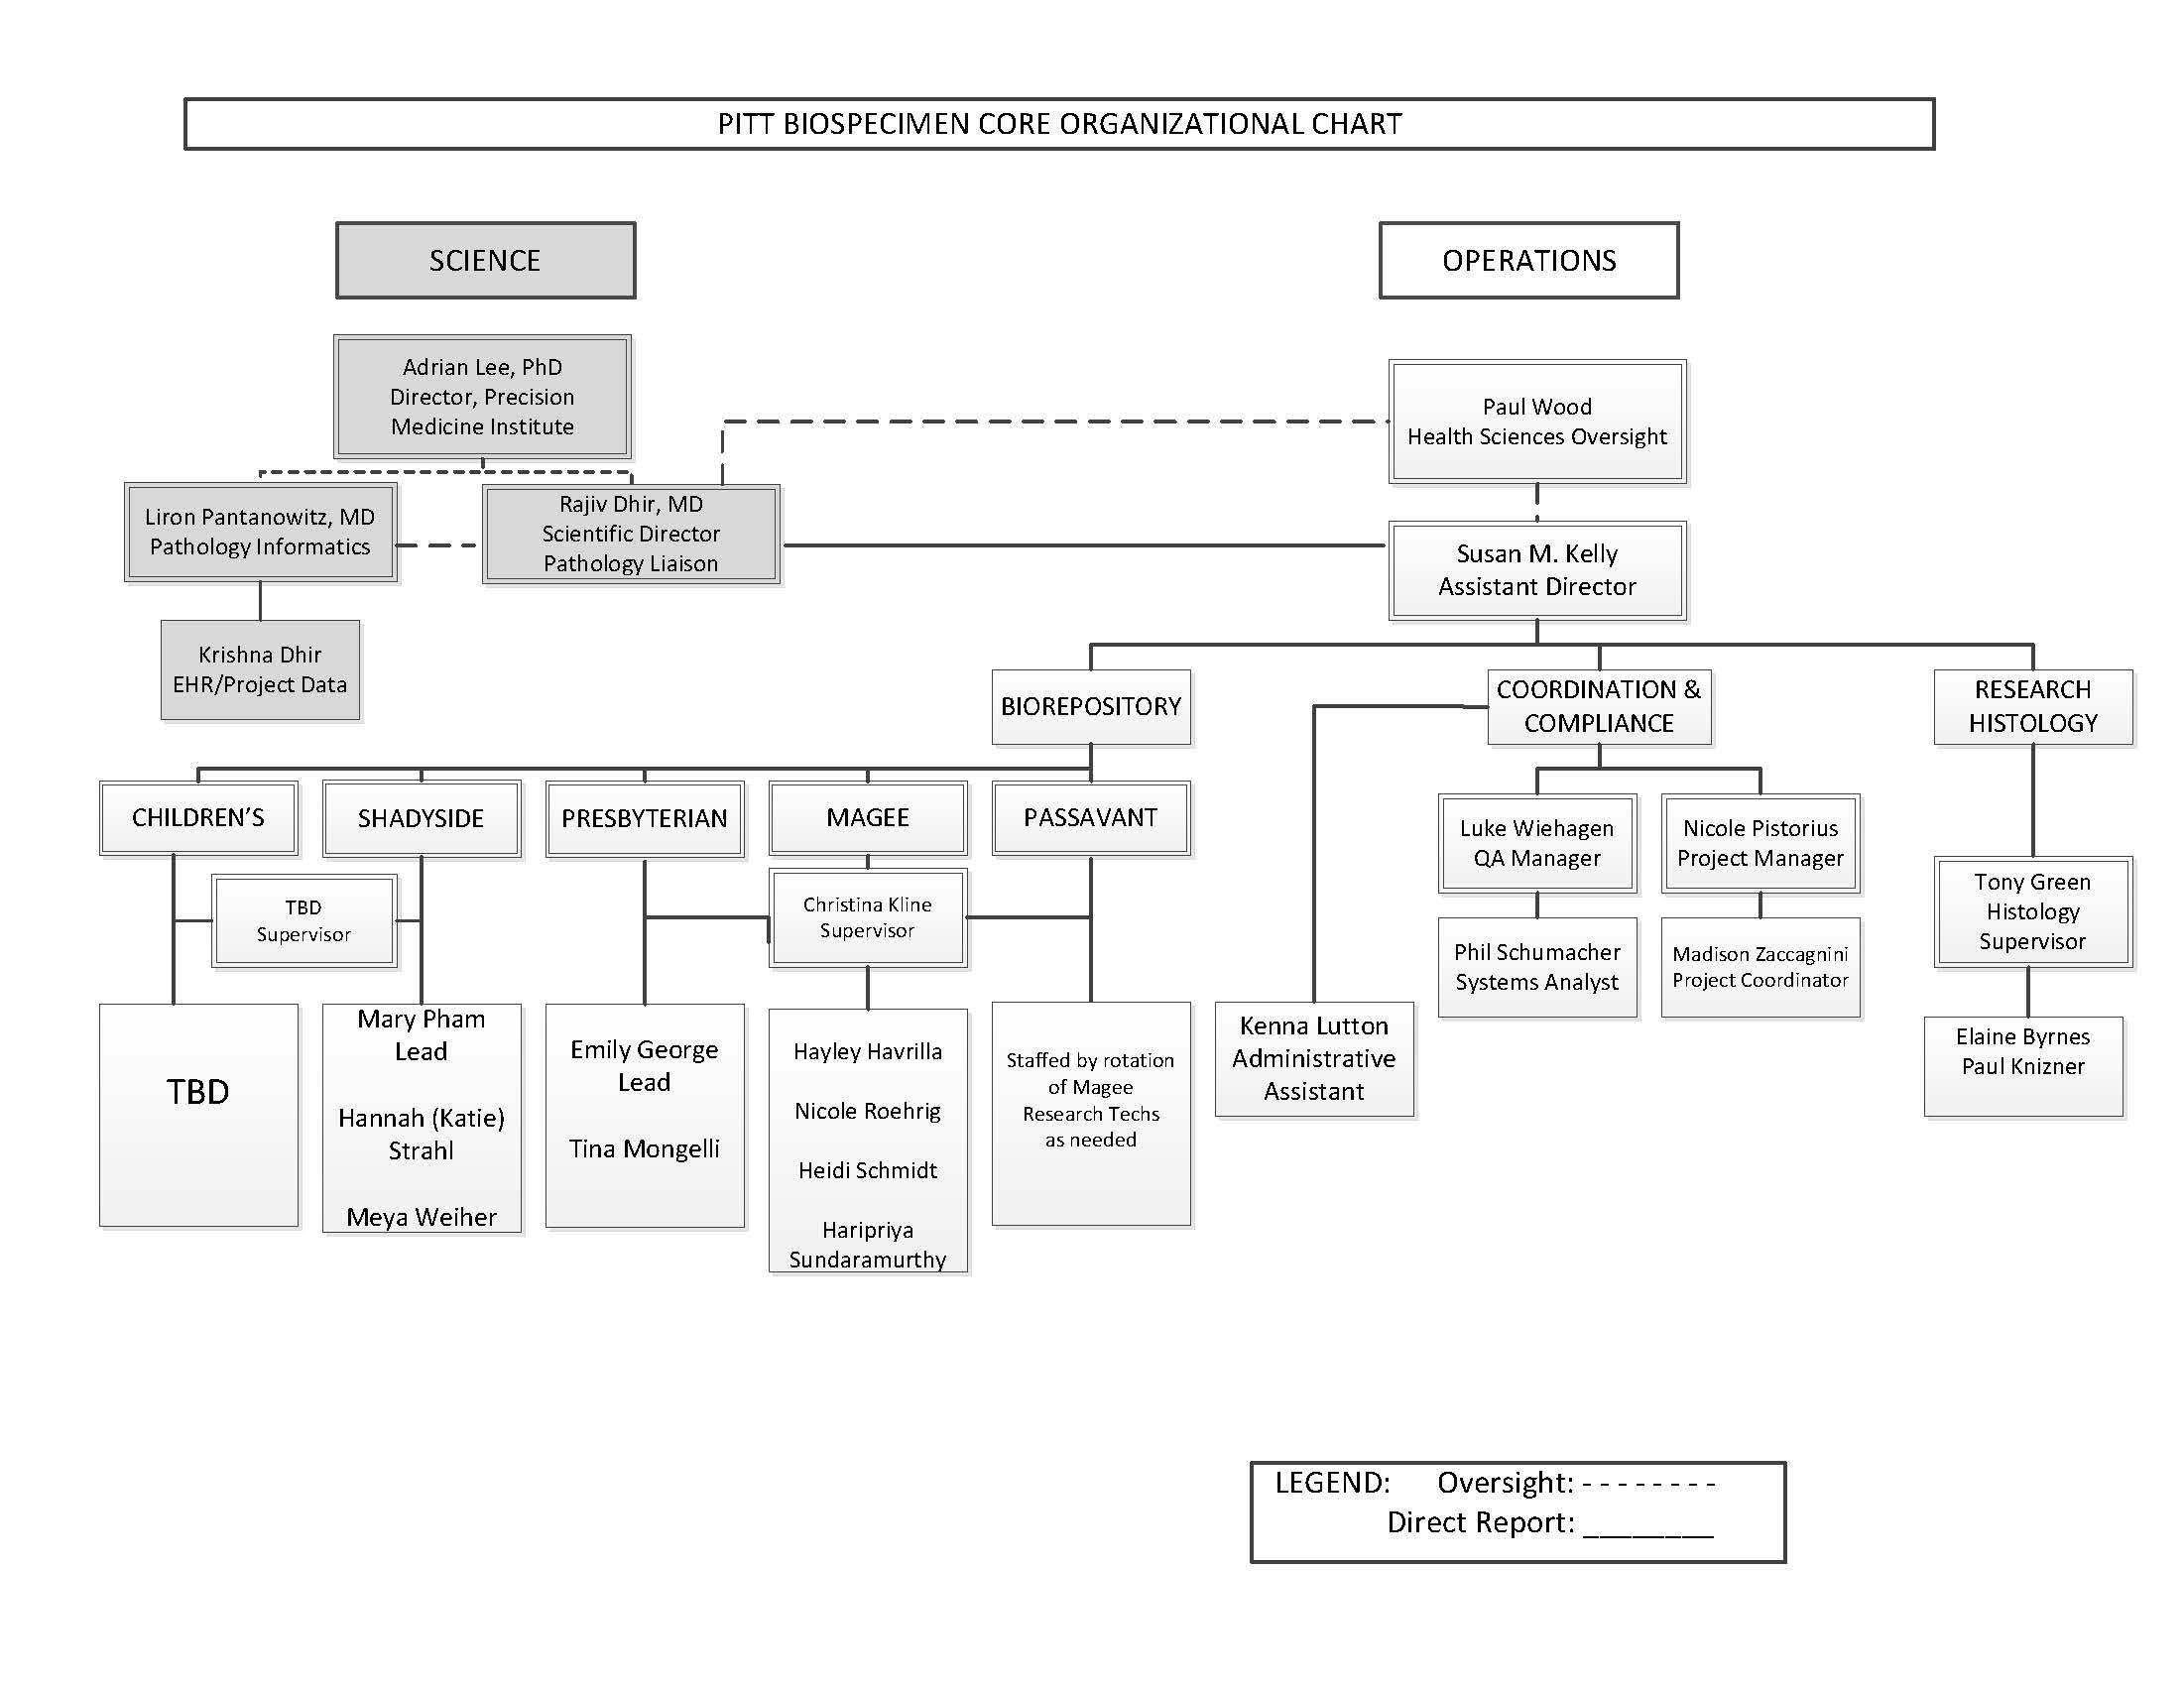 Pitt Biospecimen Core org chart